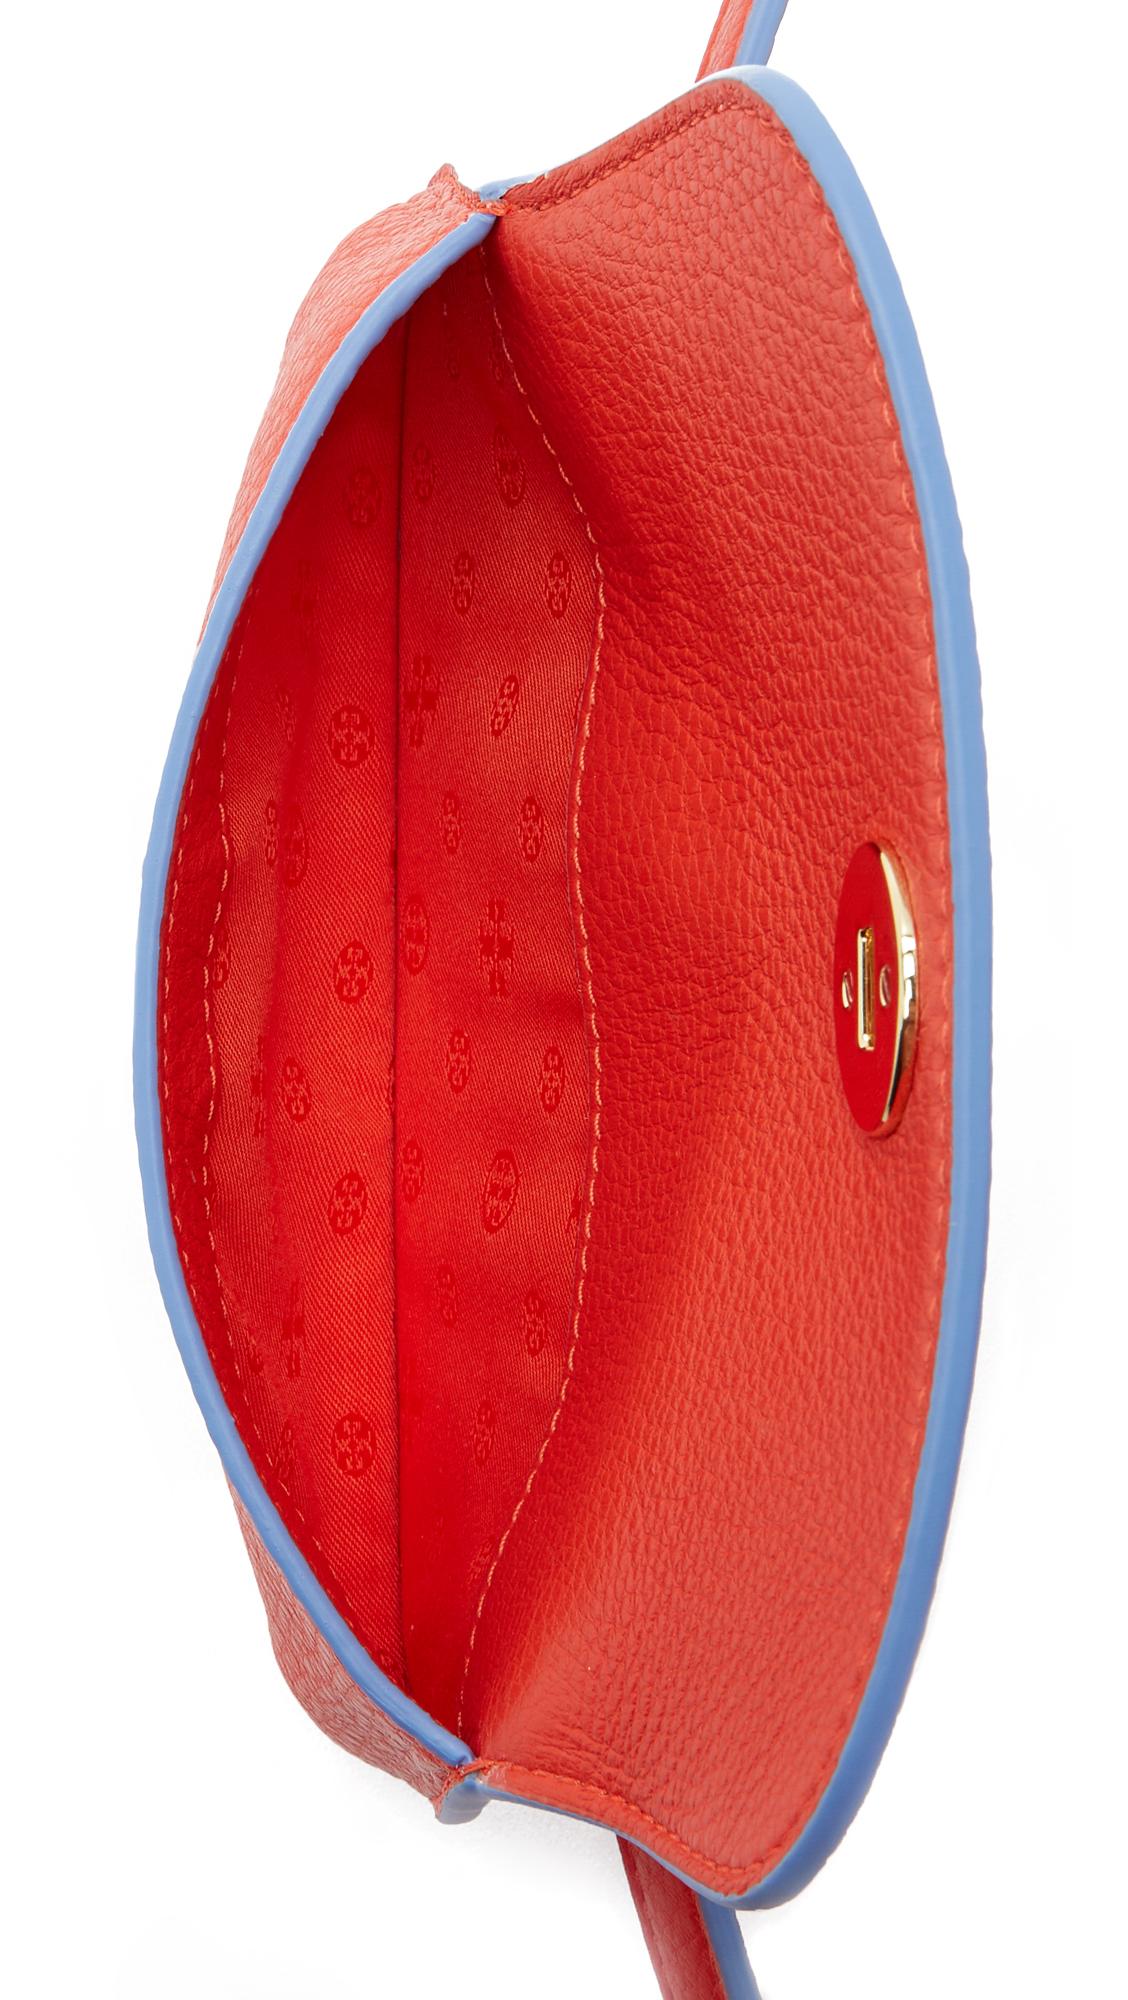 b75d4dfb6376 Tory Burch Diana Belt Bag